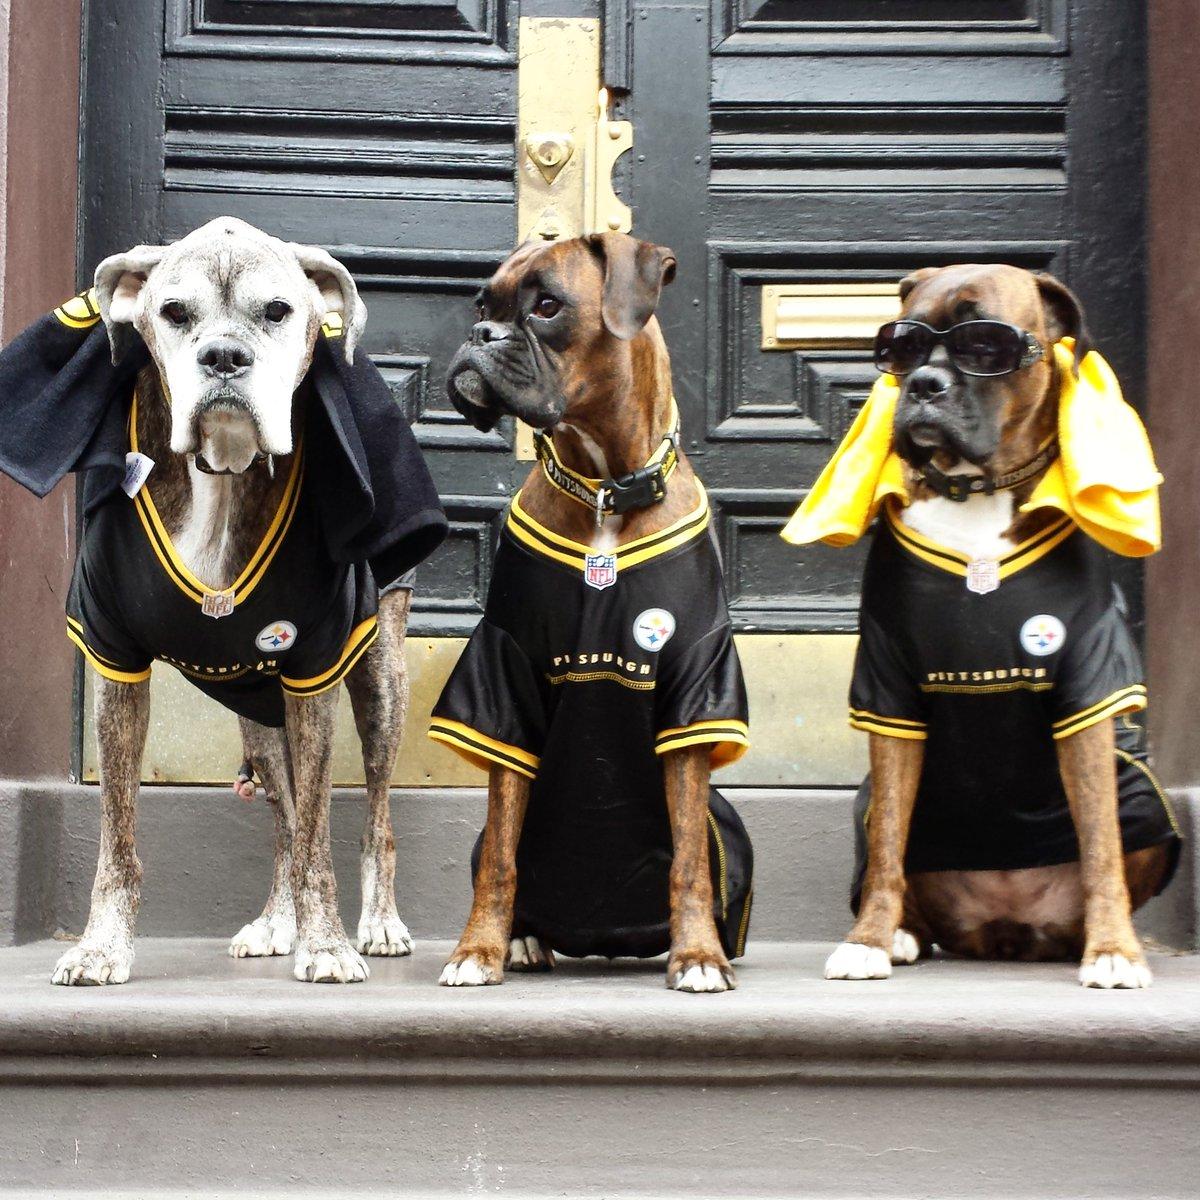 Baddest #Steelers Fans out there! (L-R) Kota is @_BigBen7 , Donut is @DeAngeloRB & Tana is @jharrison9292 #HereWeGo https://t.co/FAmKIV67cA